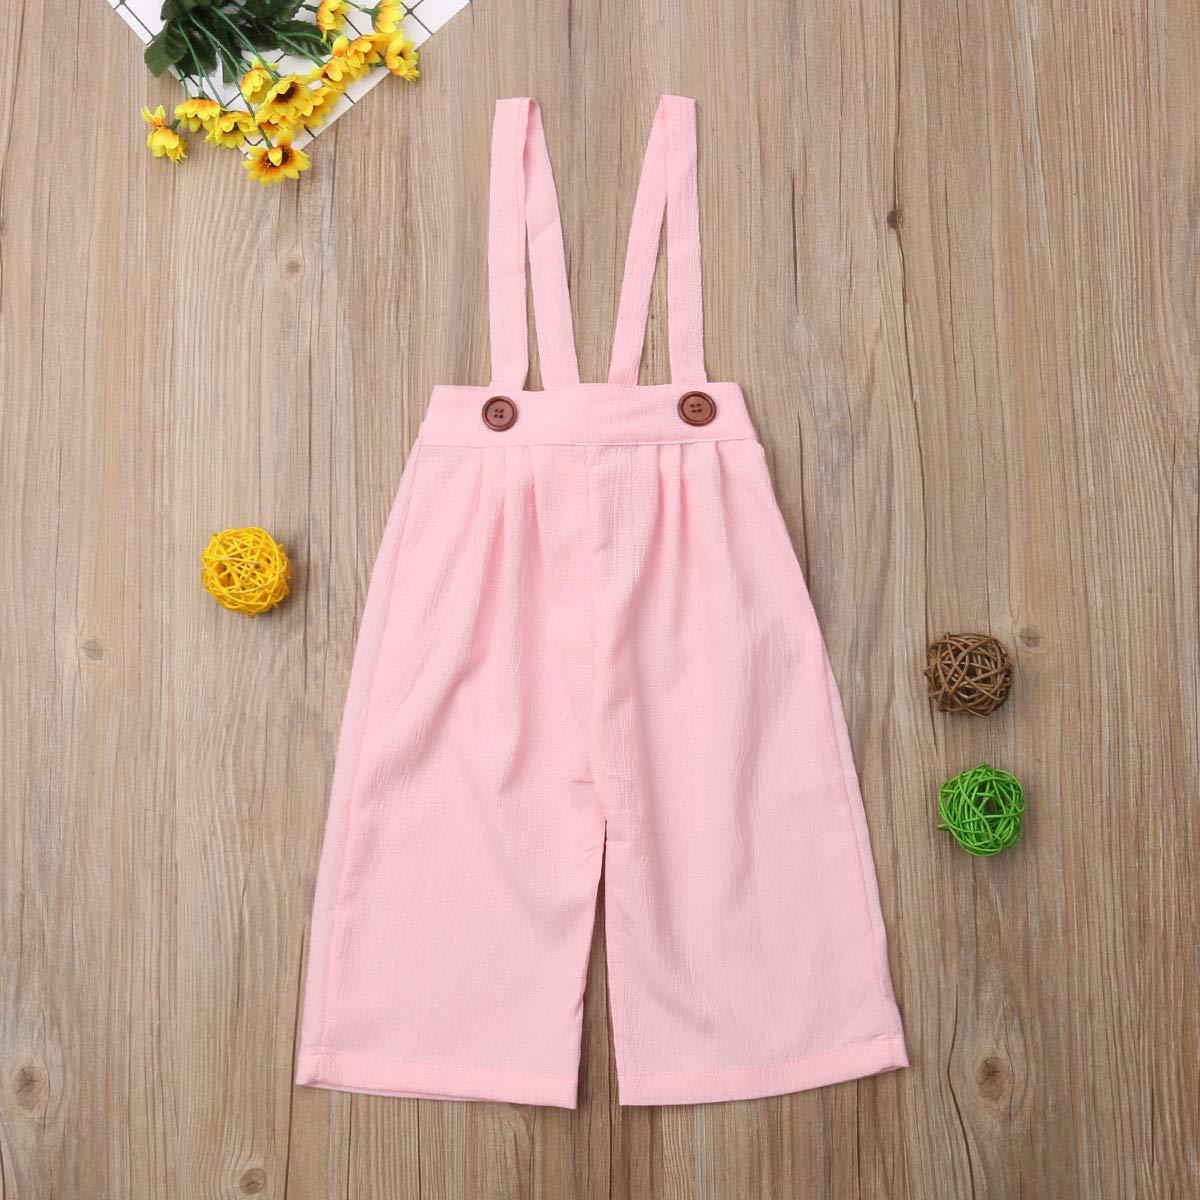 Toddler Baby Girl Strap Pants Kids Adjustable Suspender Pants Overall Chiffon Jumpsuit